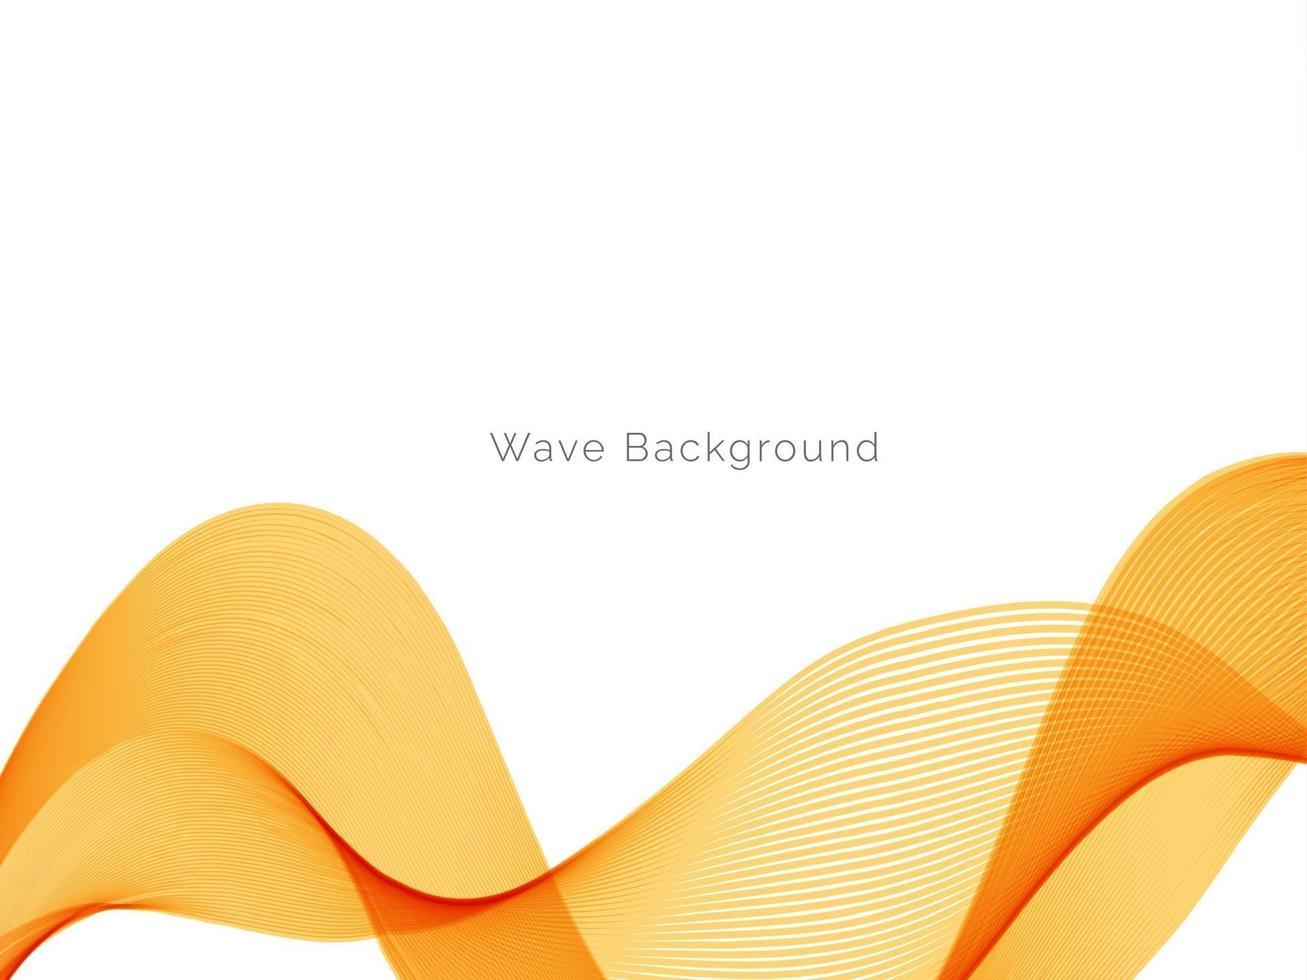 decoratief ontwerp modern met stijlvolle gladde gele golf achtergrond vector